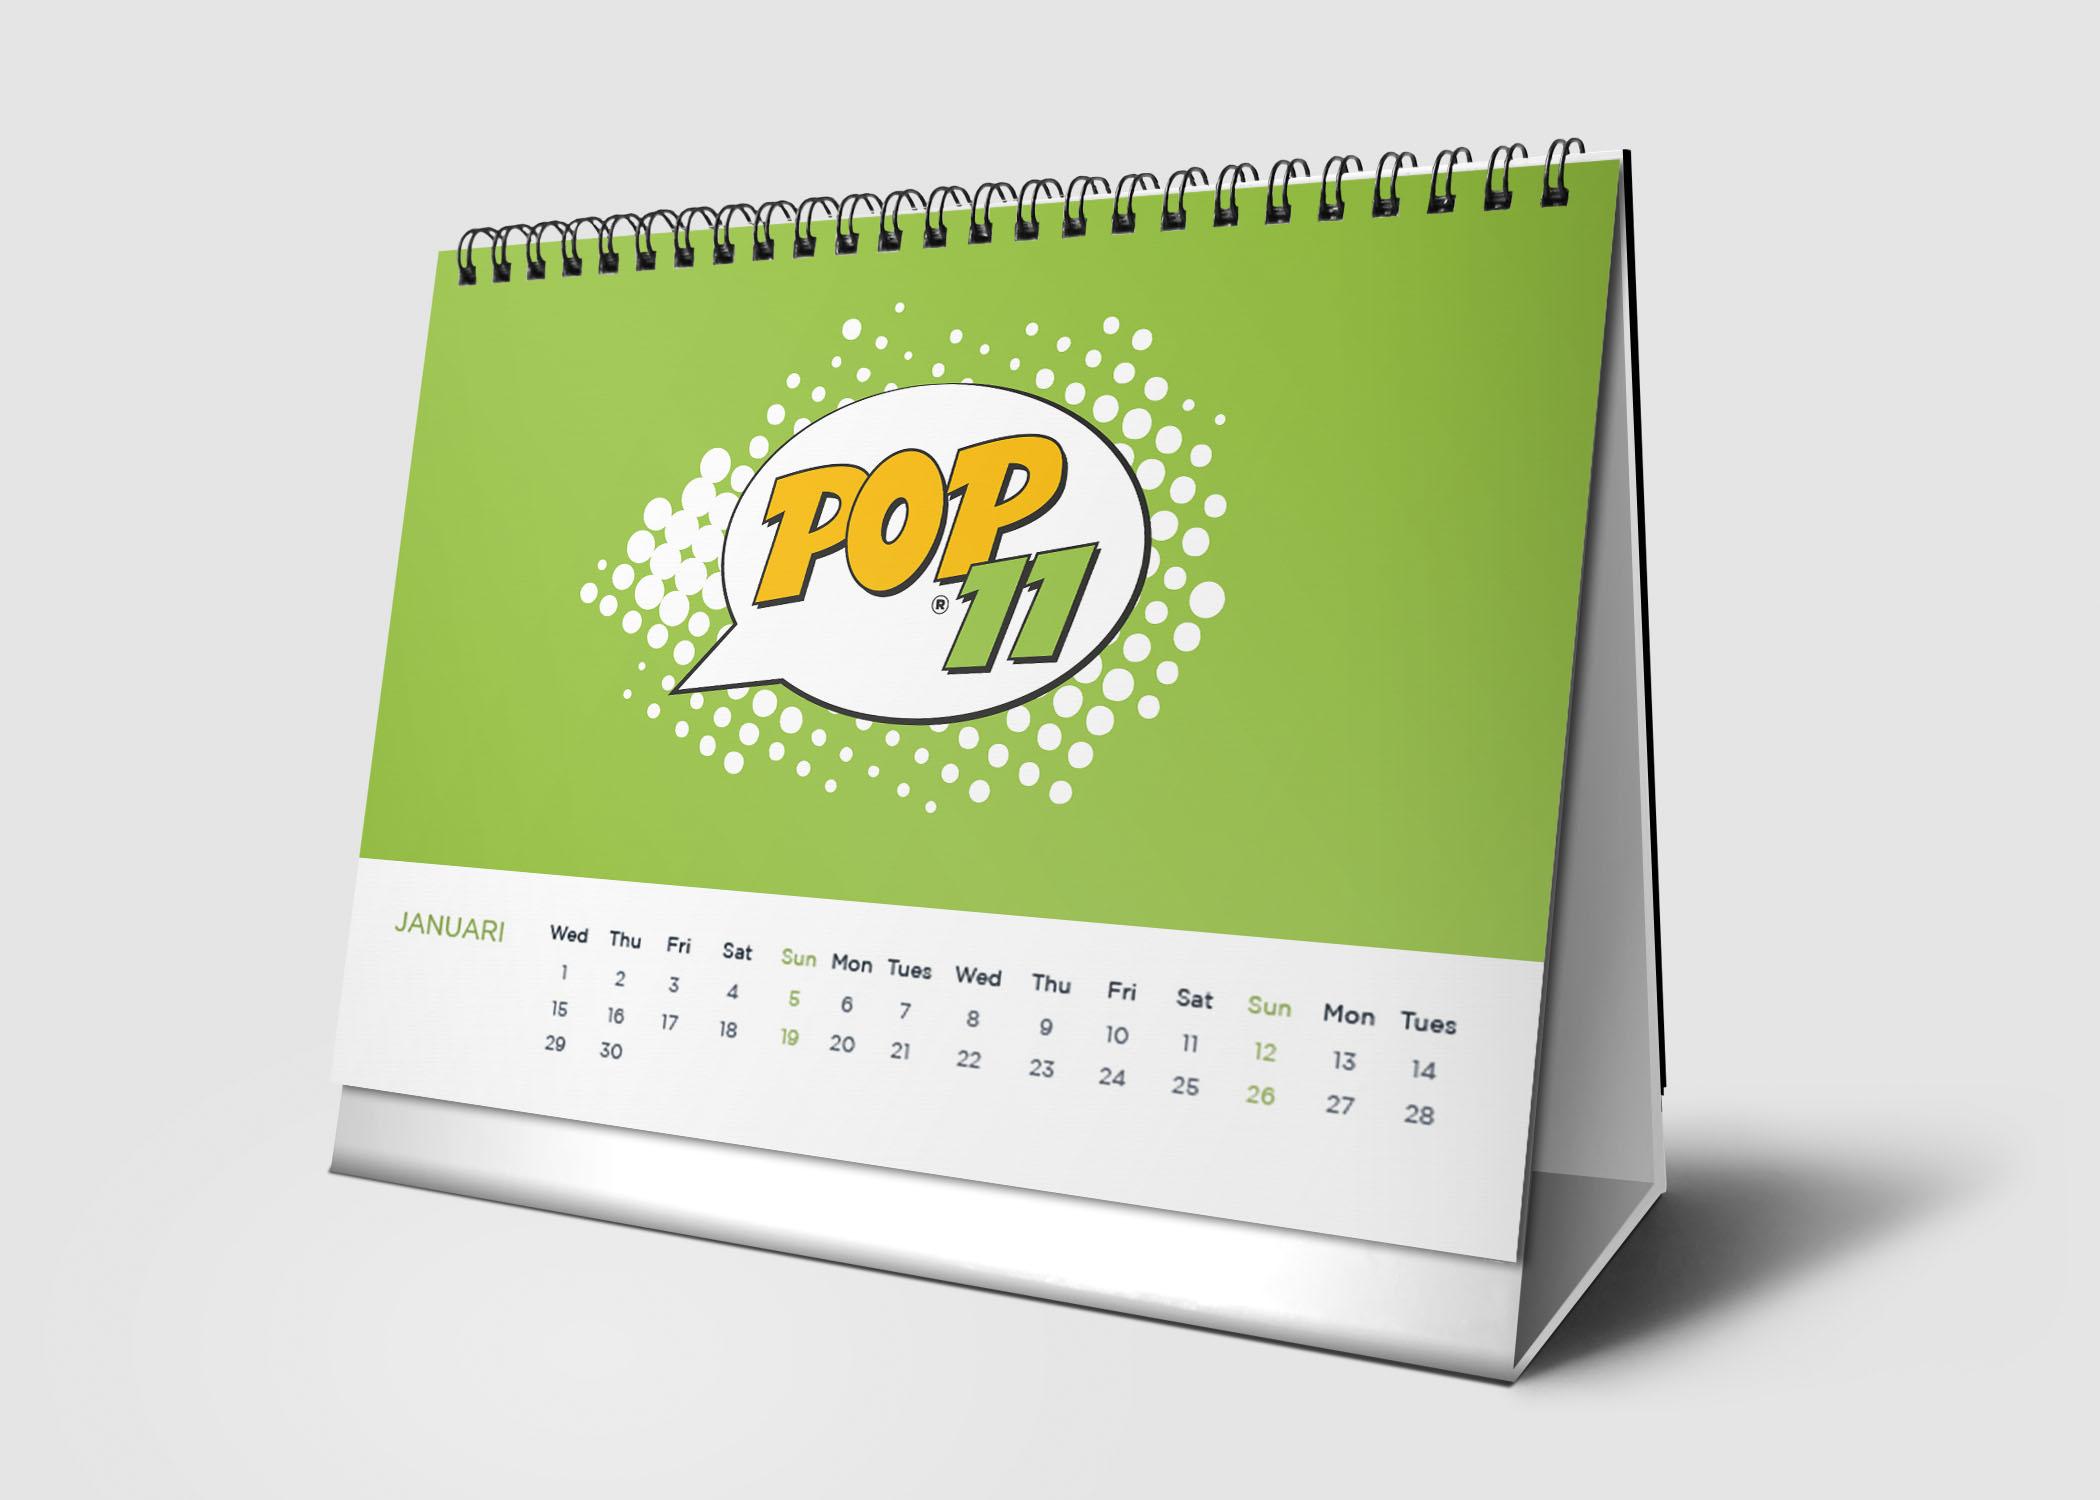 01-calendar Pop11 Digital Prints